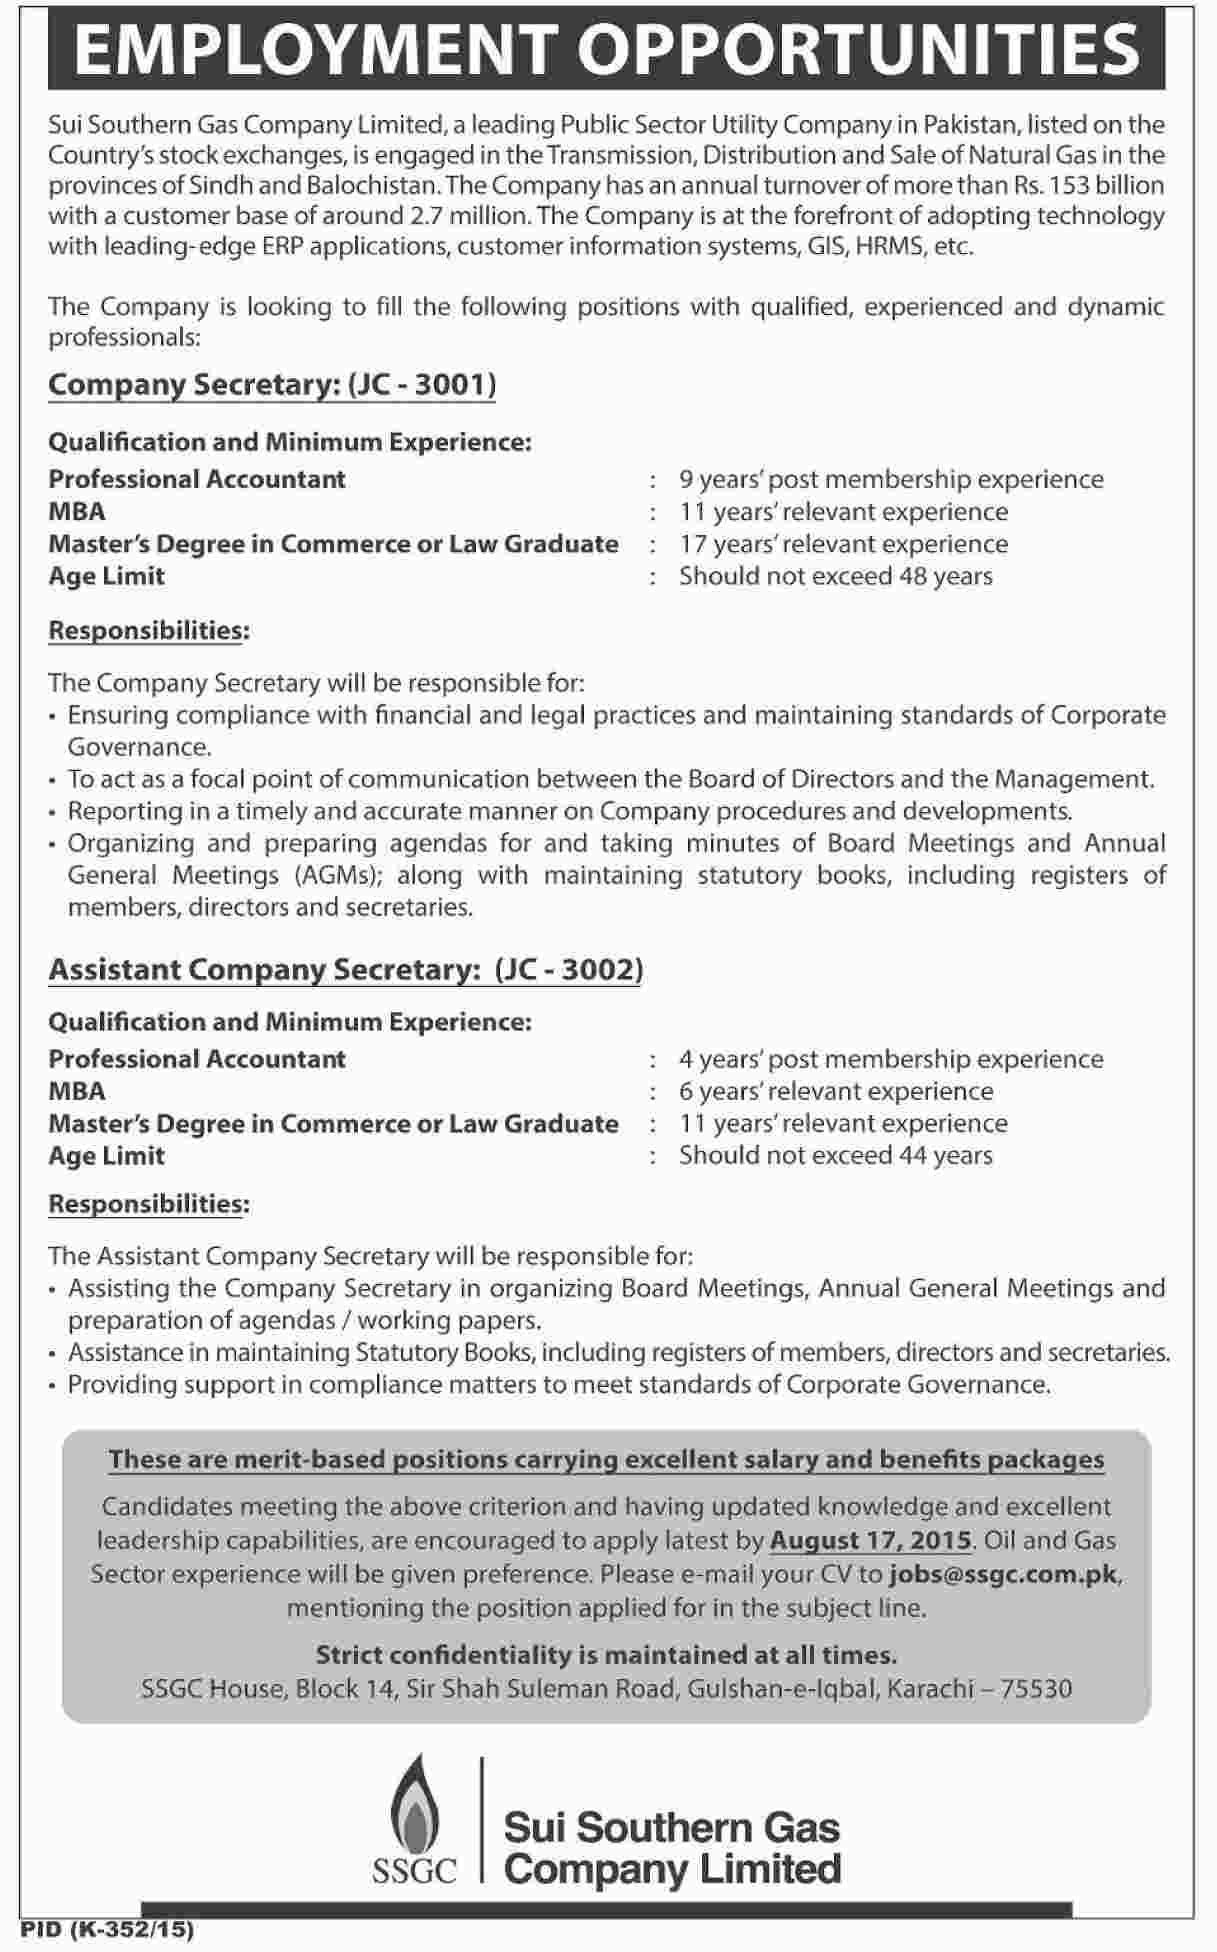 Sui Southern Gas Company SSGC Jobs 2015 Secretary, Assistant Secretary Apply Online